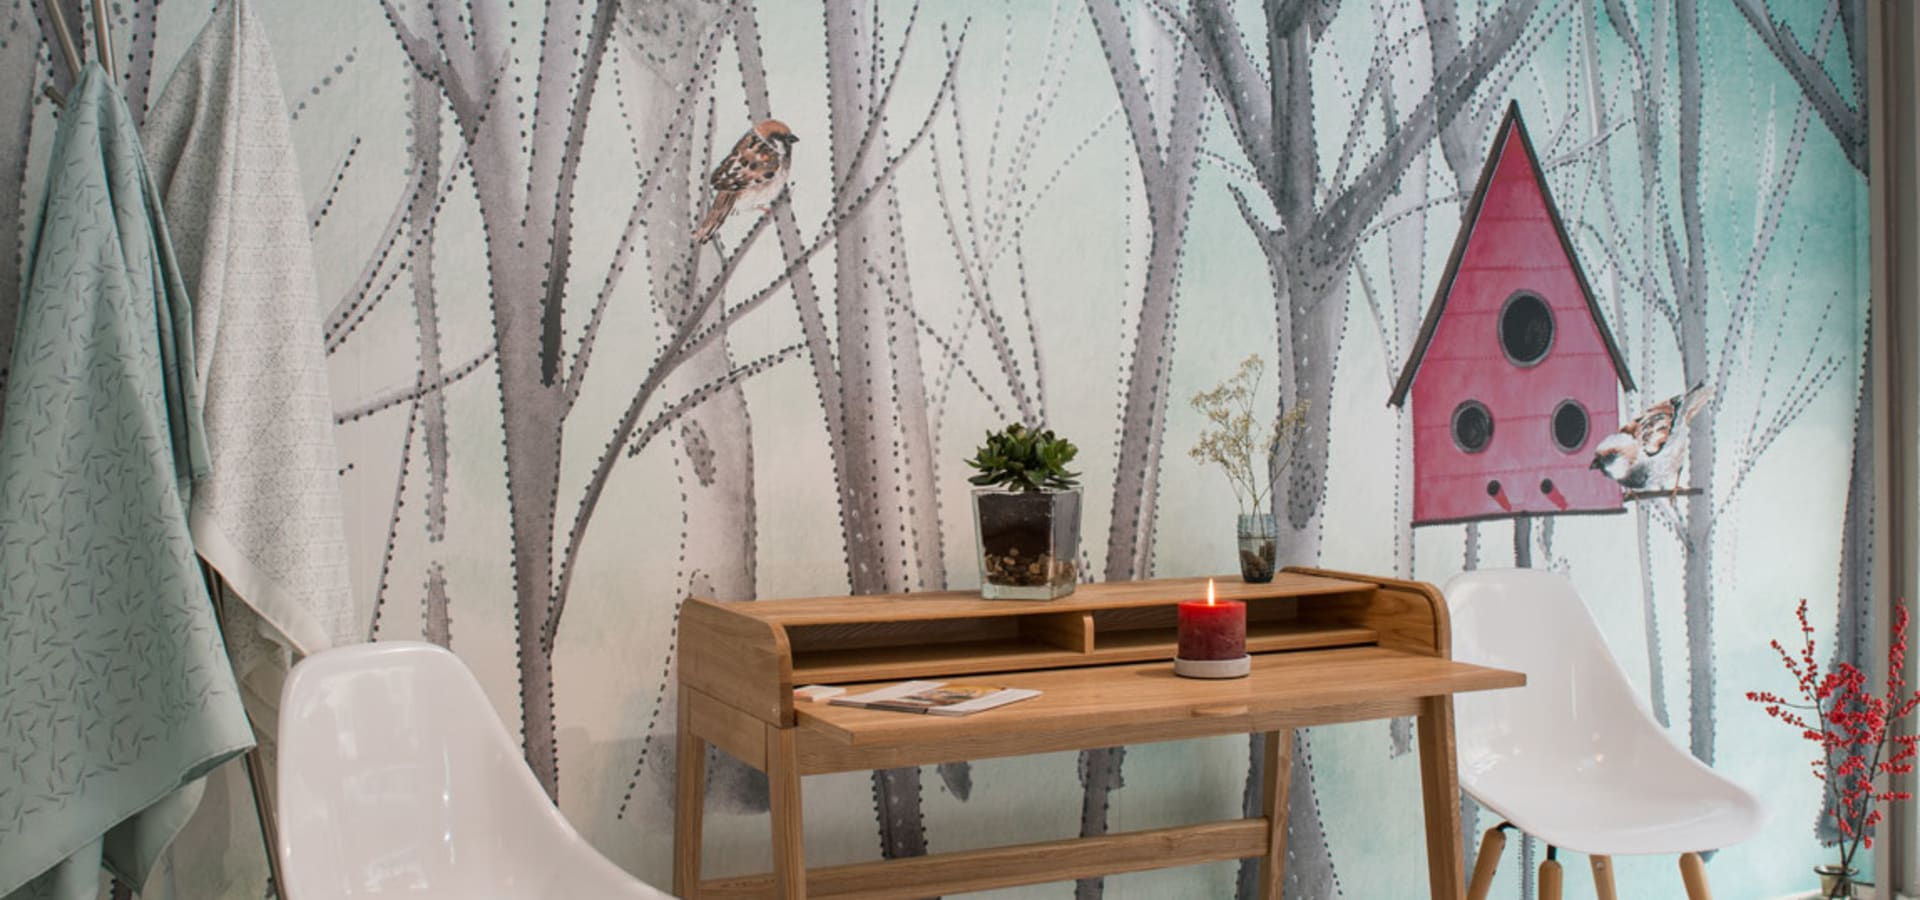 silvia betancourt designs raumausstatter interior. Black Bedroom Furniture Sets. Home Design Ideas